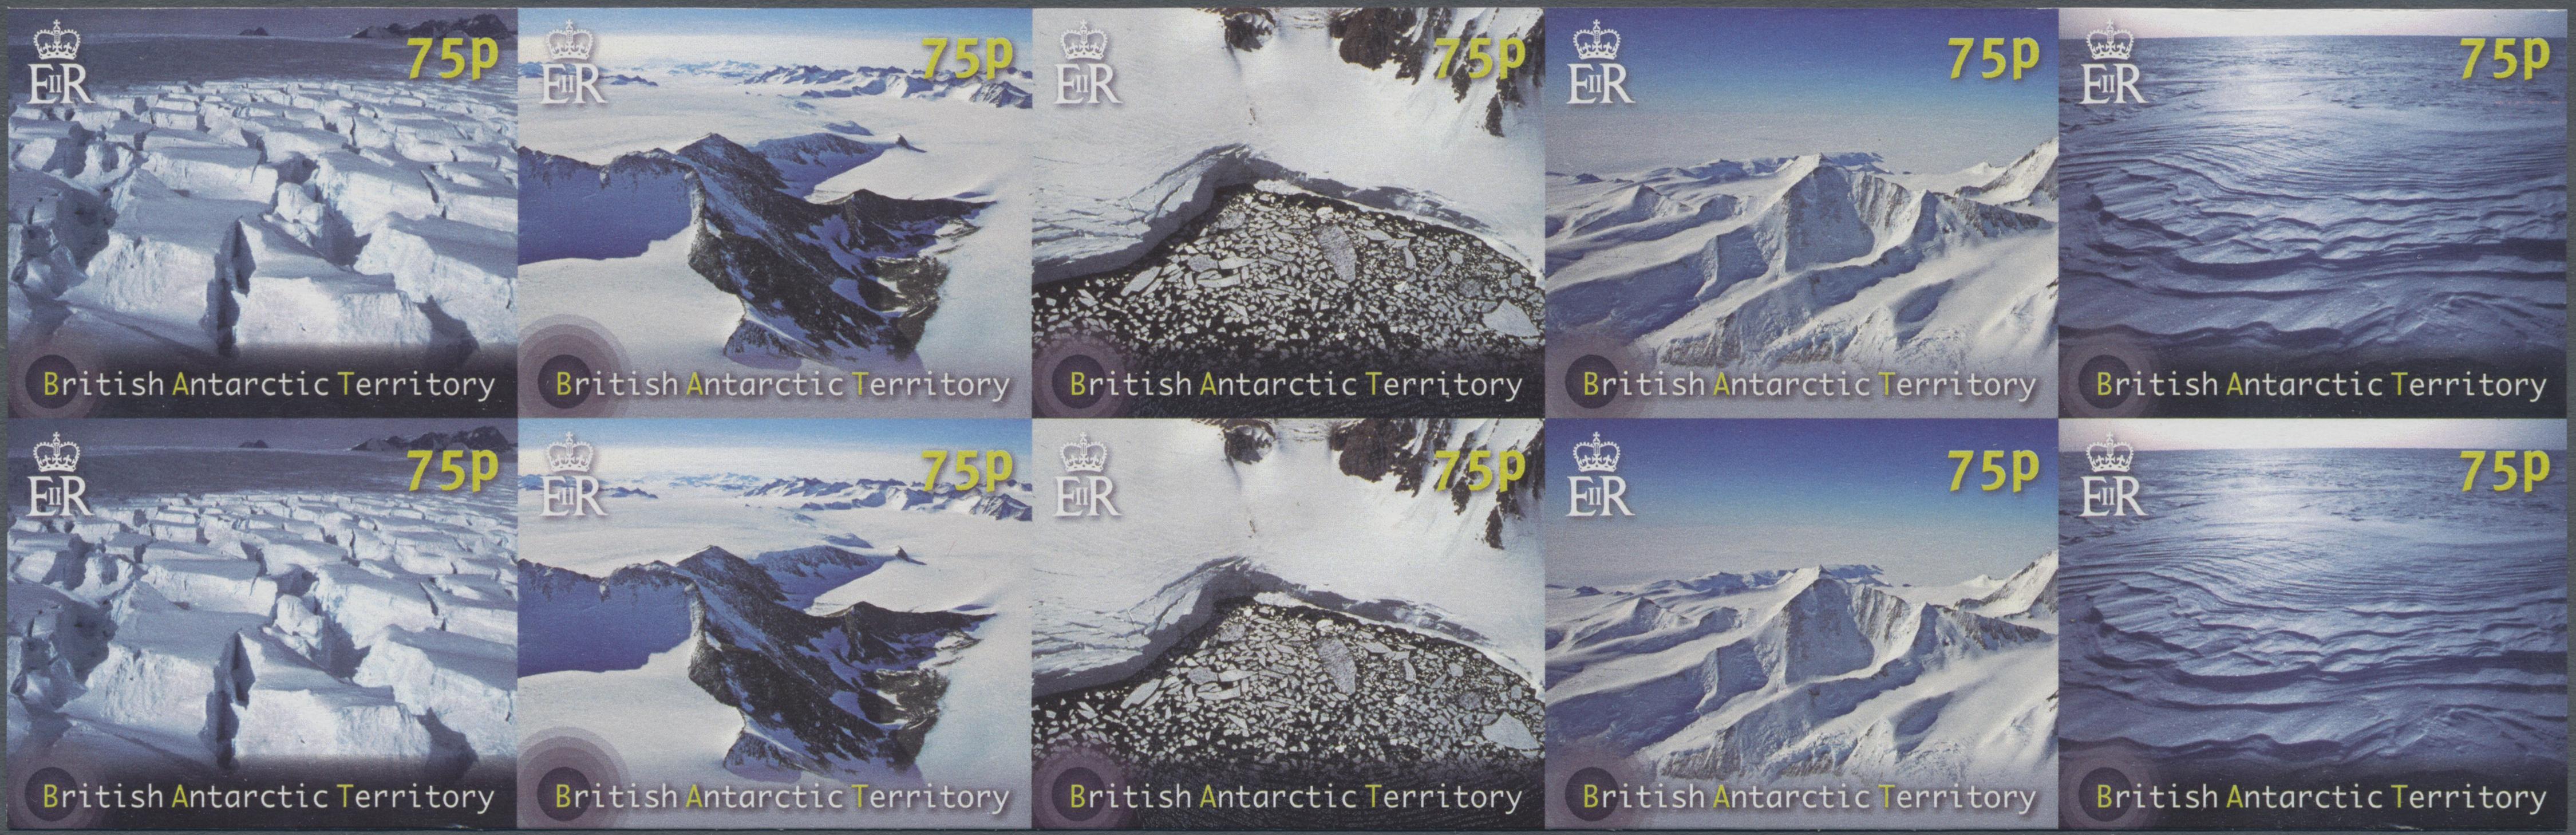 Lot 07406 - thematik: antarktis / antarctic  -  Auktionshaus Christoph Gärtner GmbH & Co. KG 50th Auction Anniversary Auction - Day 3